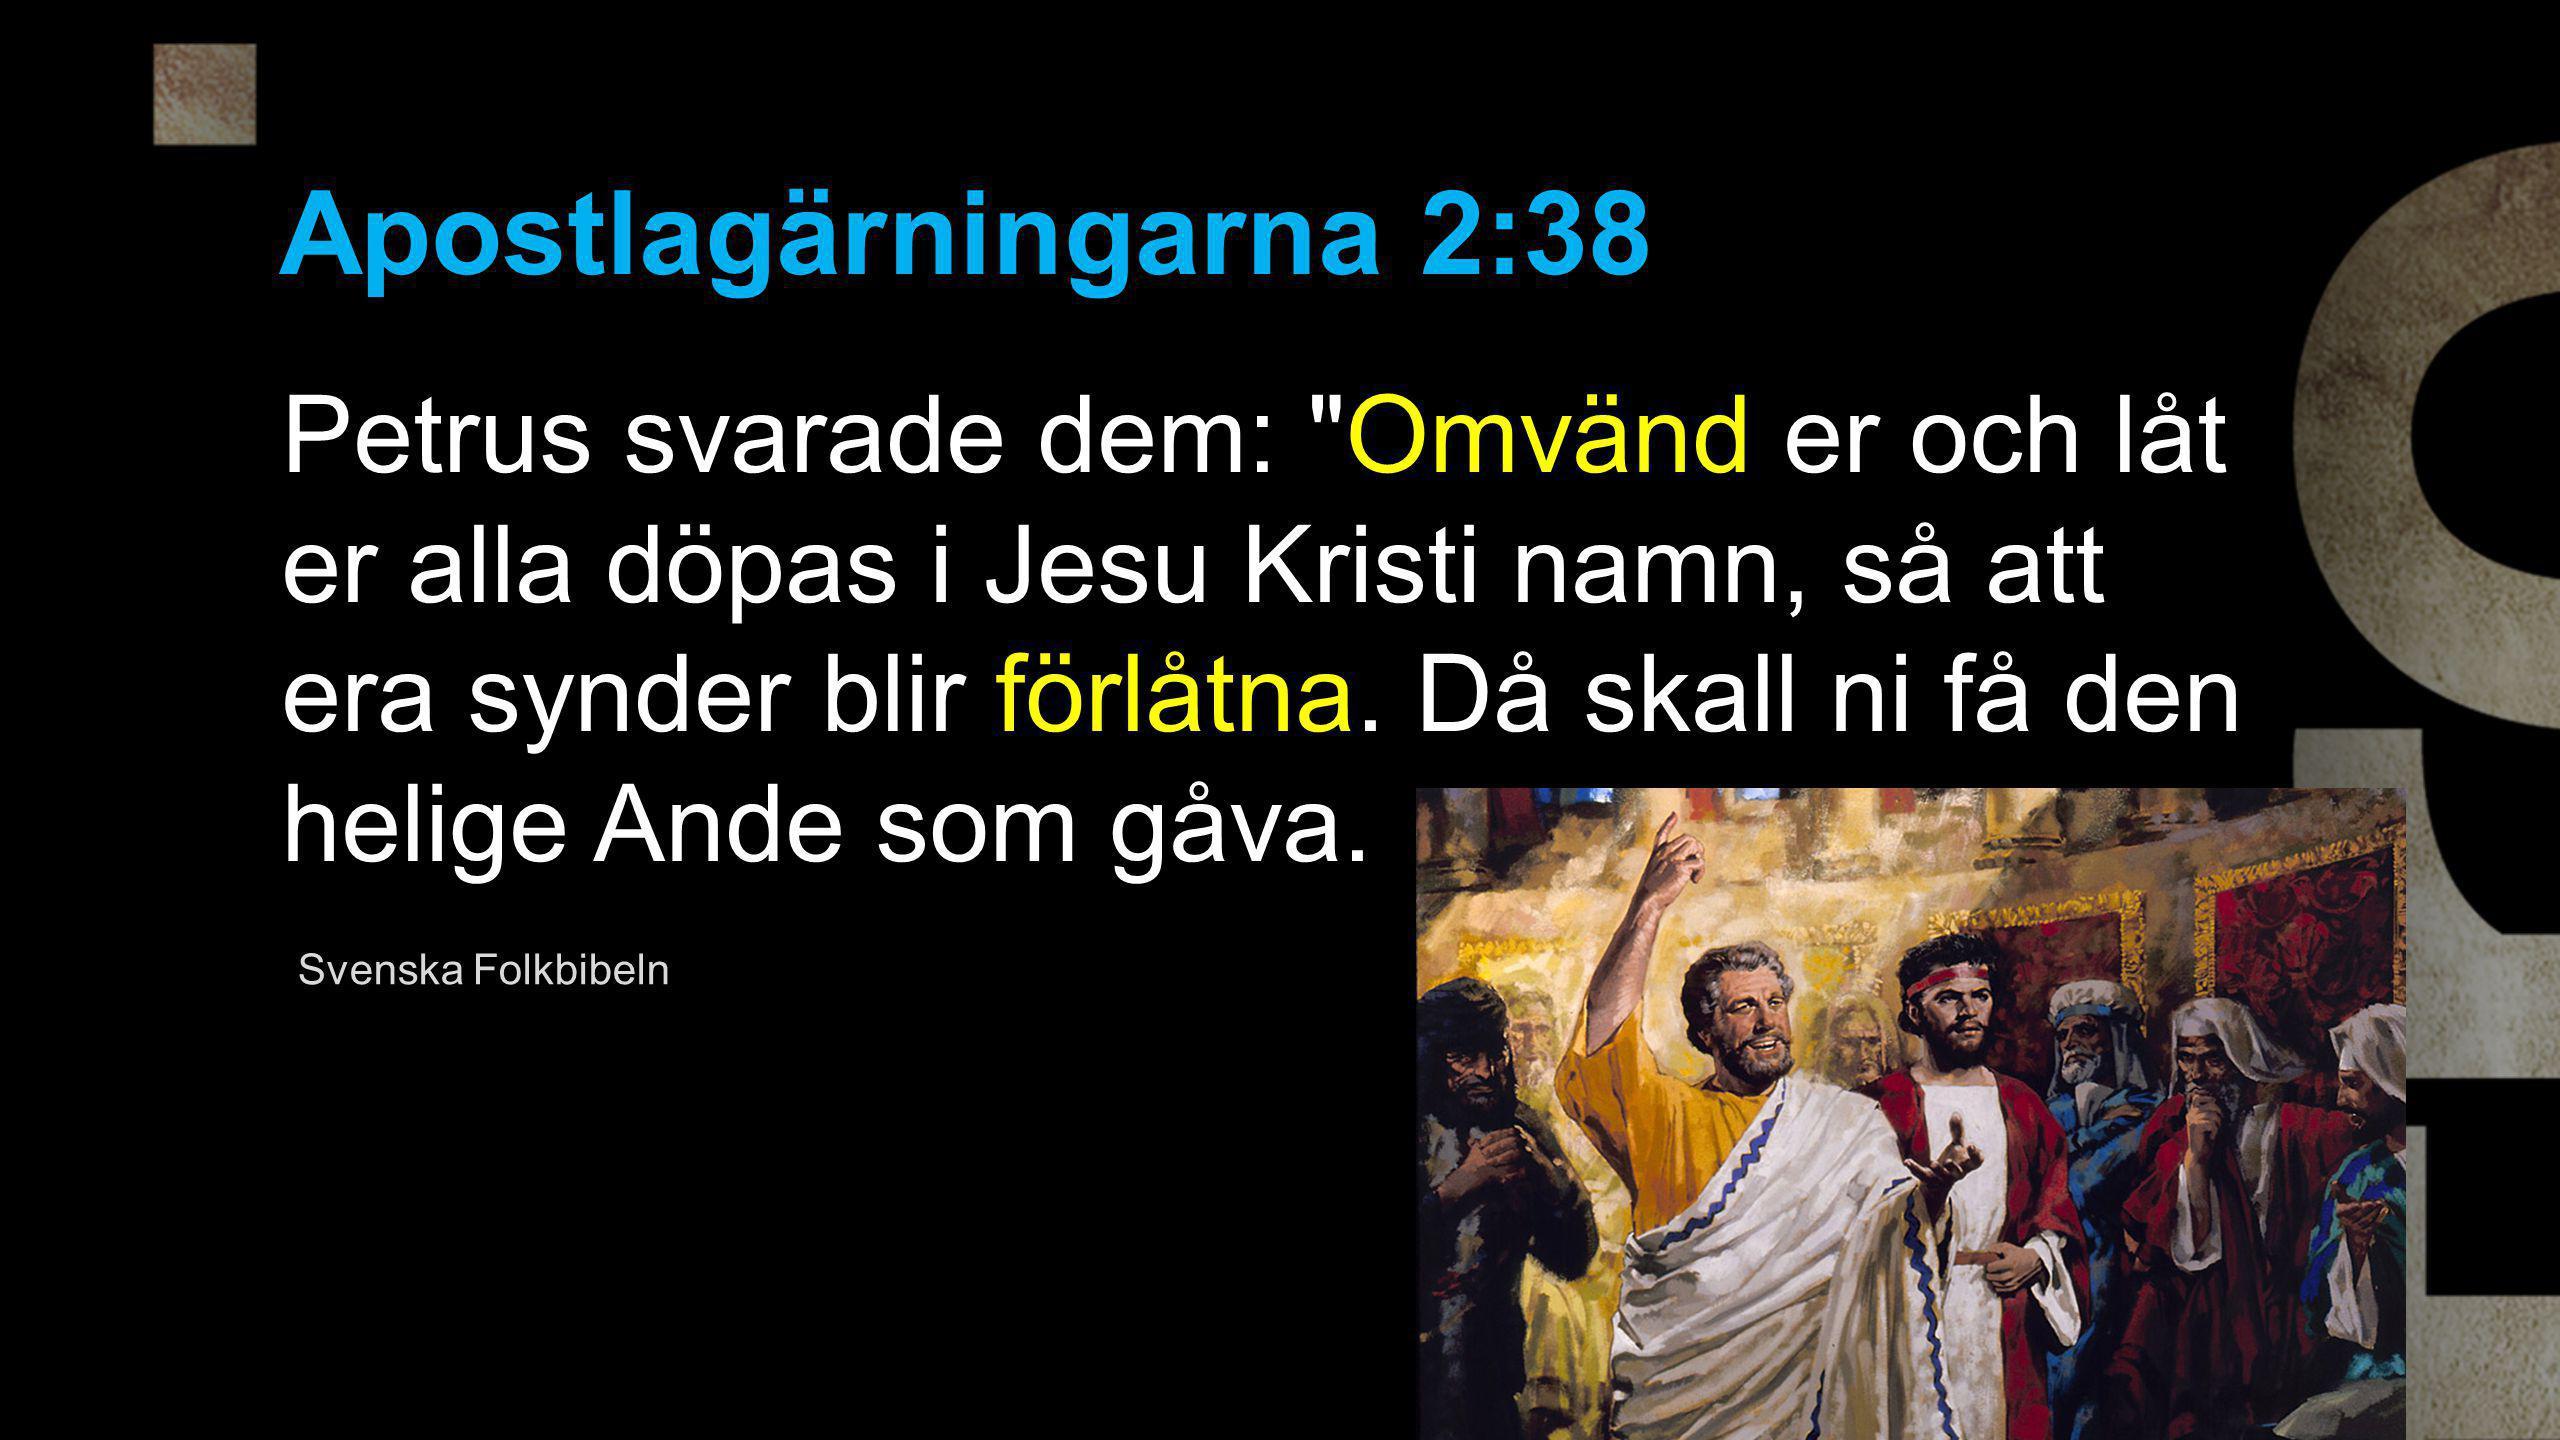 Apostlagärningarna 2:38